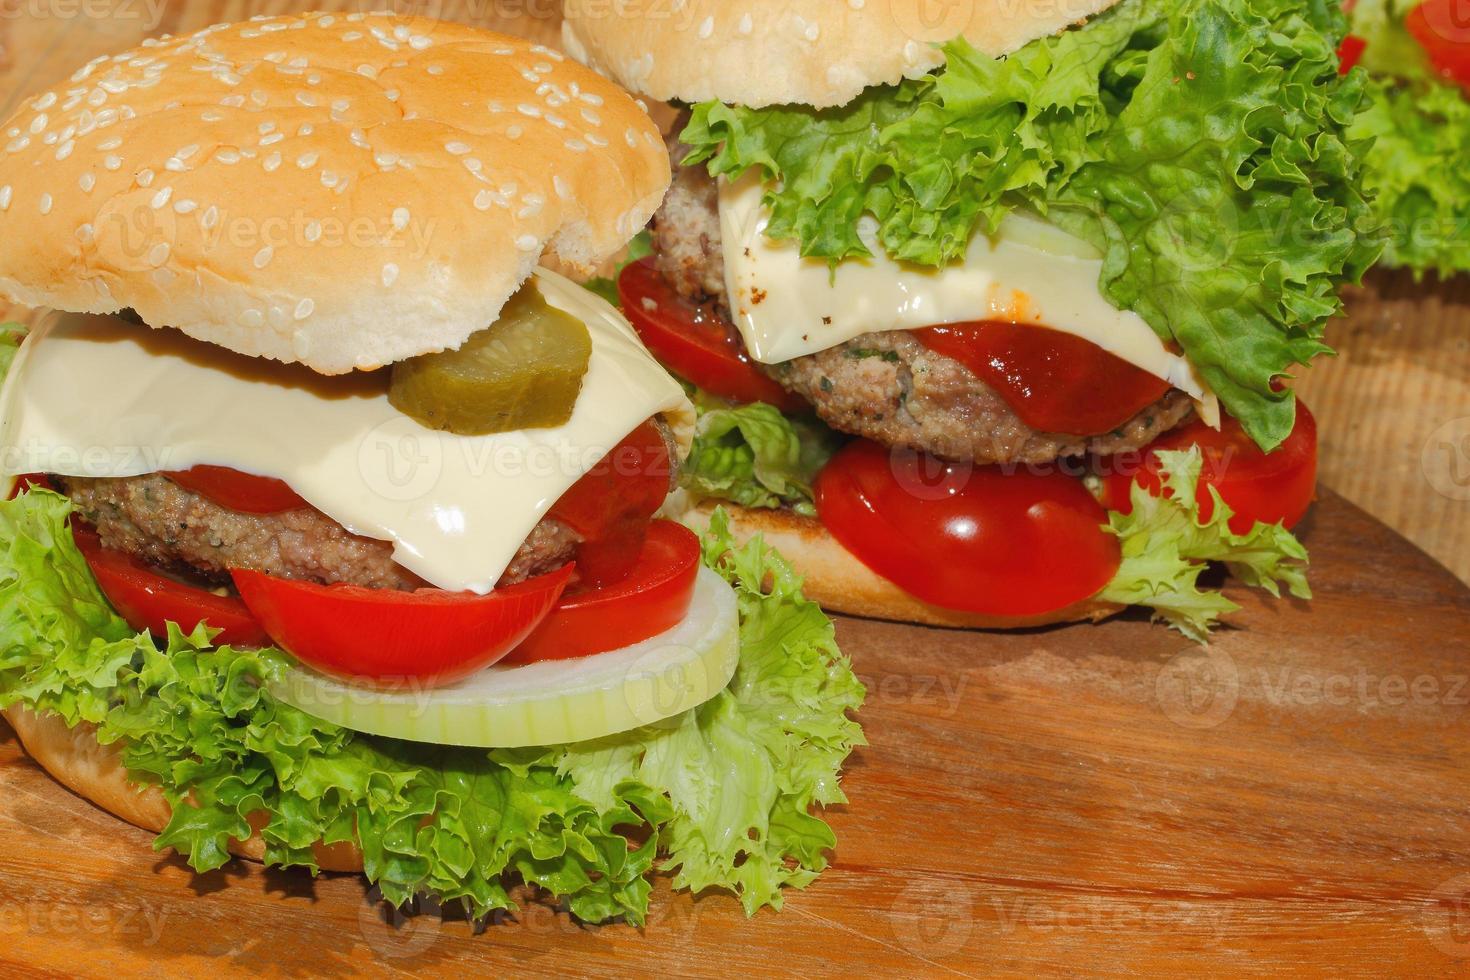 hamburguesas, comida rápida, hamburguesas, filete de hamburguesa, lechuga, tomate, queso, pepino foto